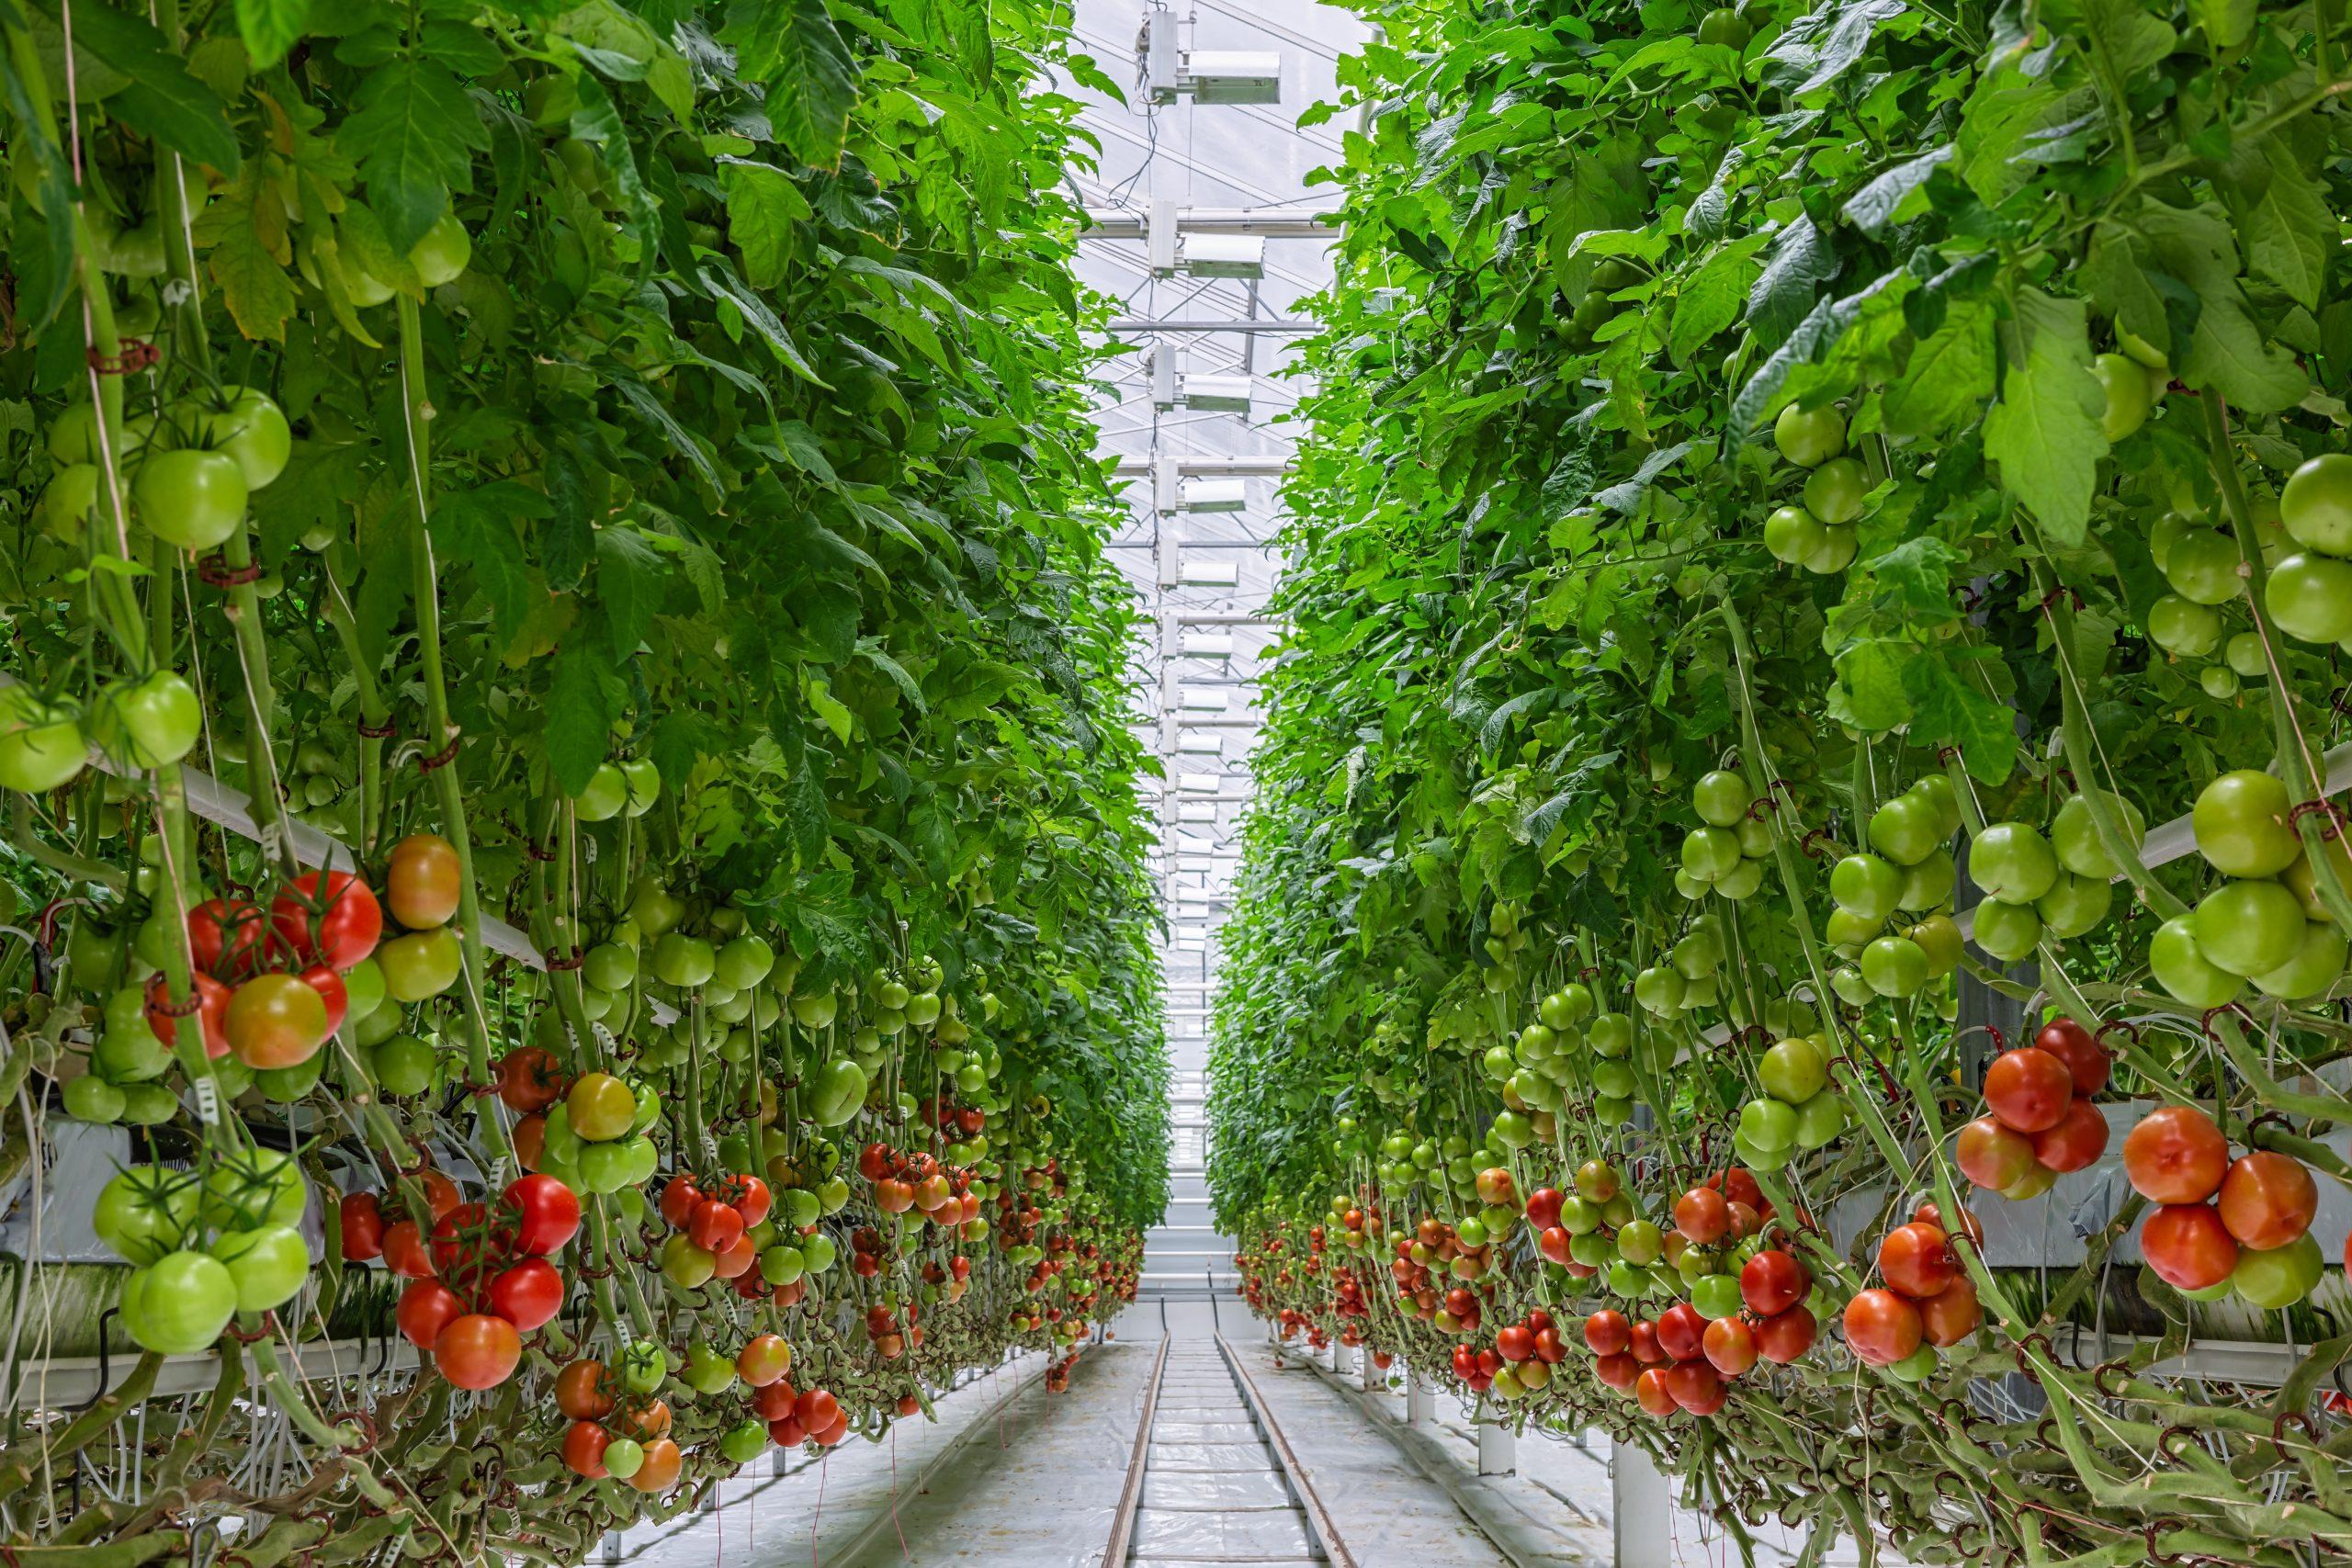 How LED grow lights helptomatogrowinginvertical farming